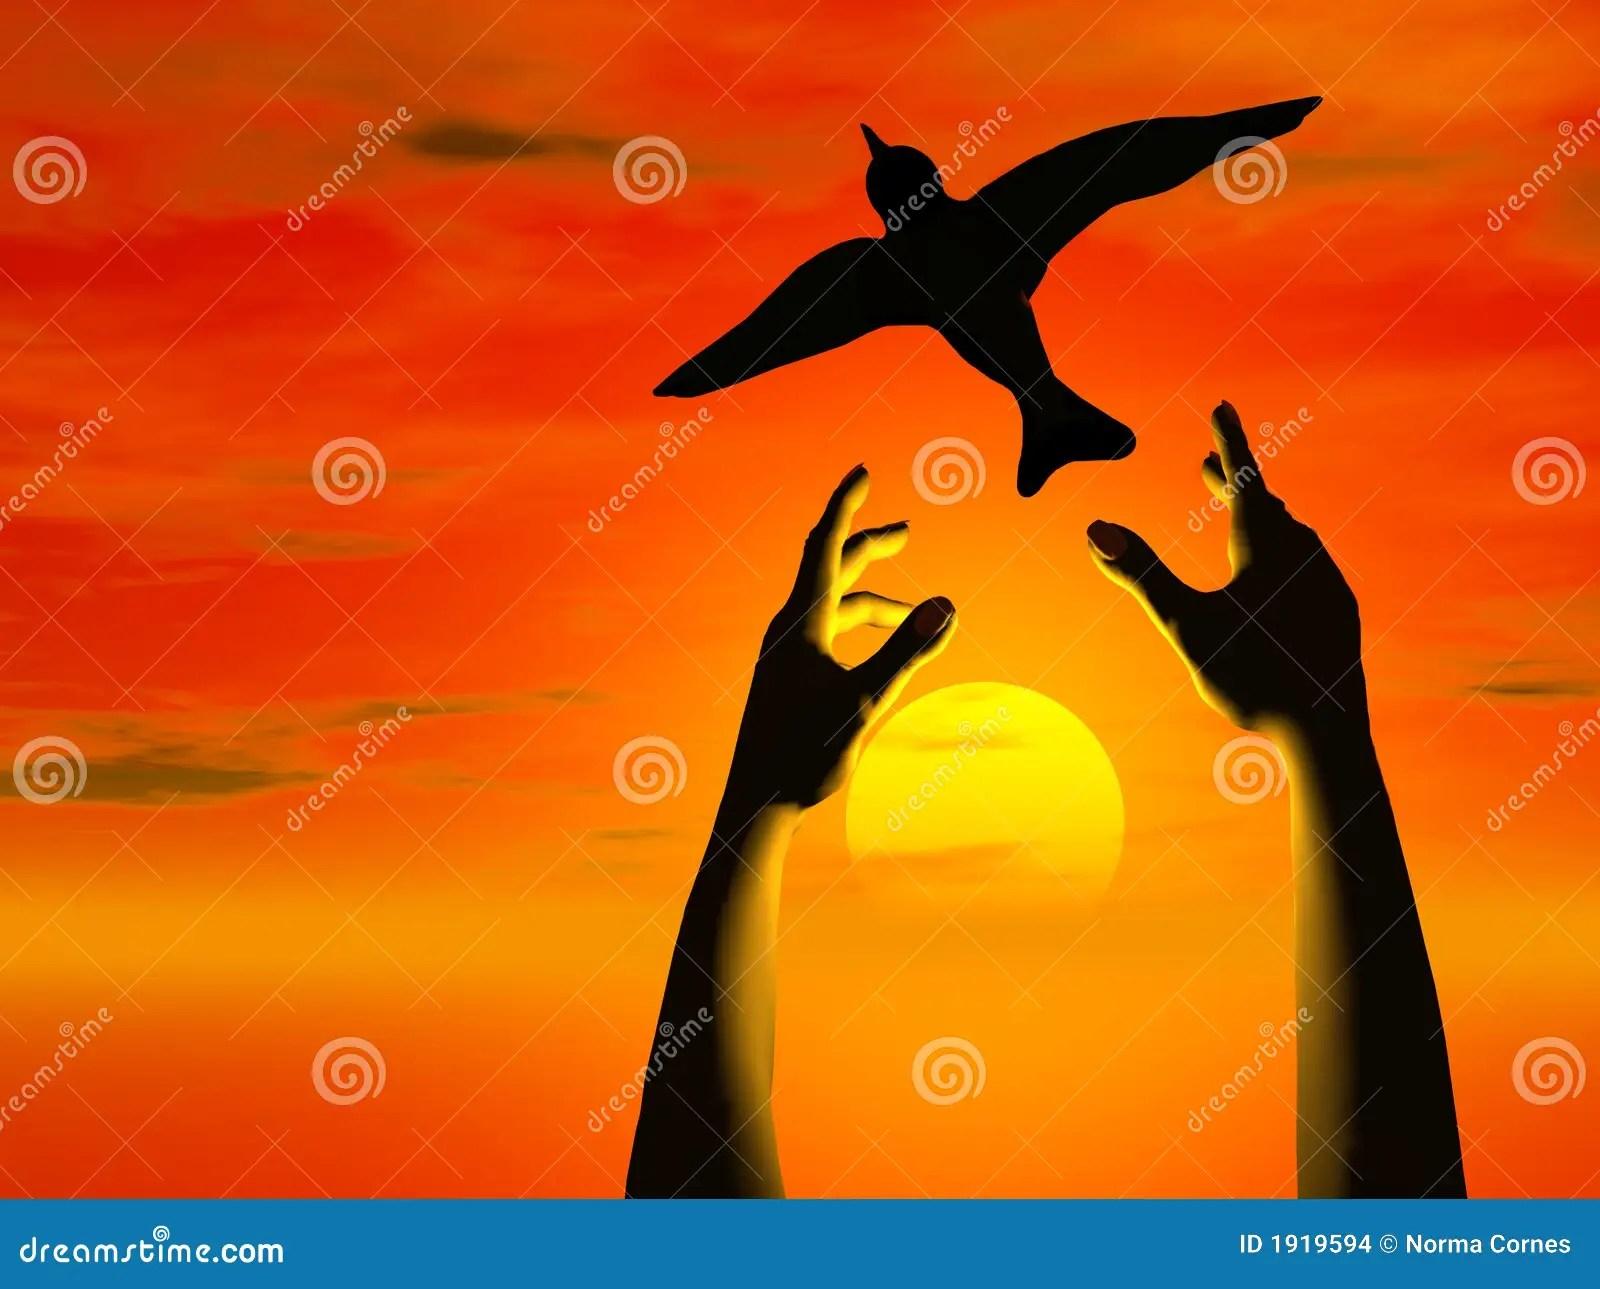 Hands Free Bird Into Sunset Illustration 1919594 Megapixl